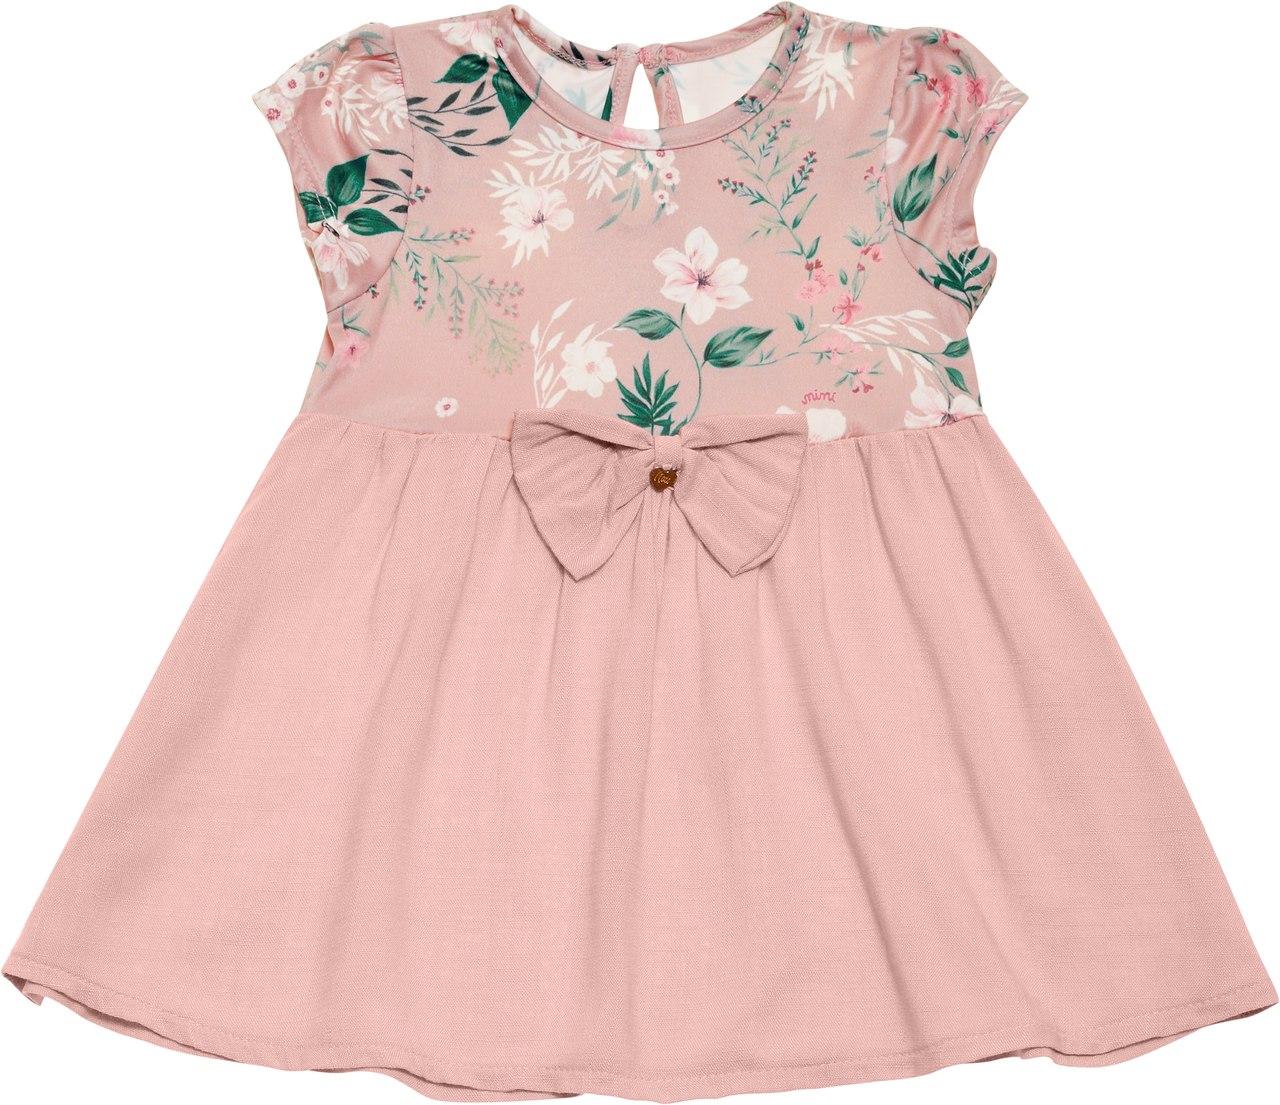 Vestido Rosa Flores e Folhas Nini & Bambini